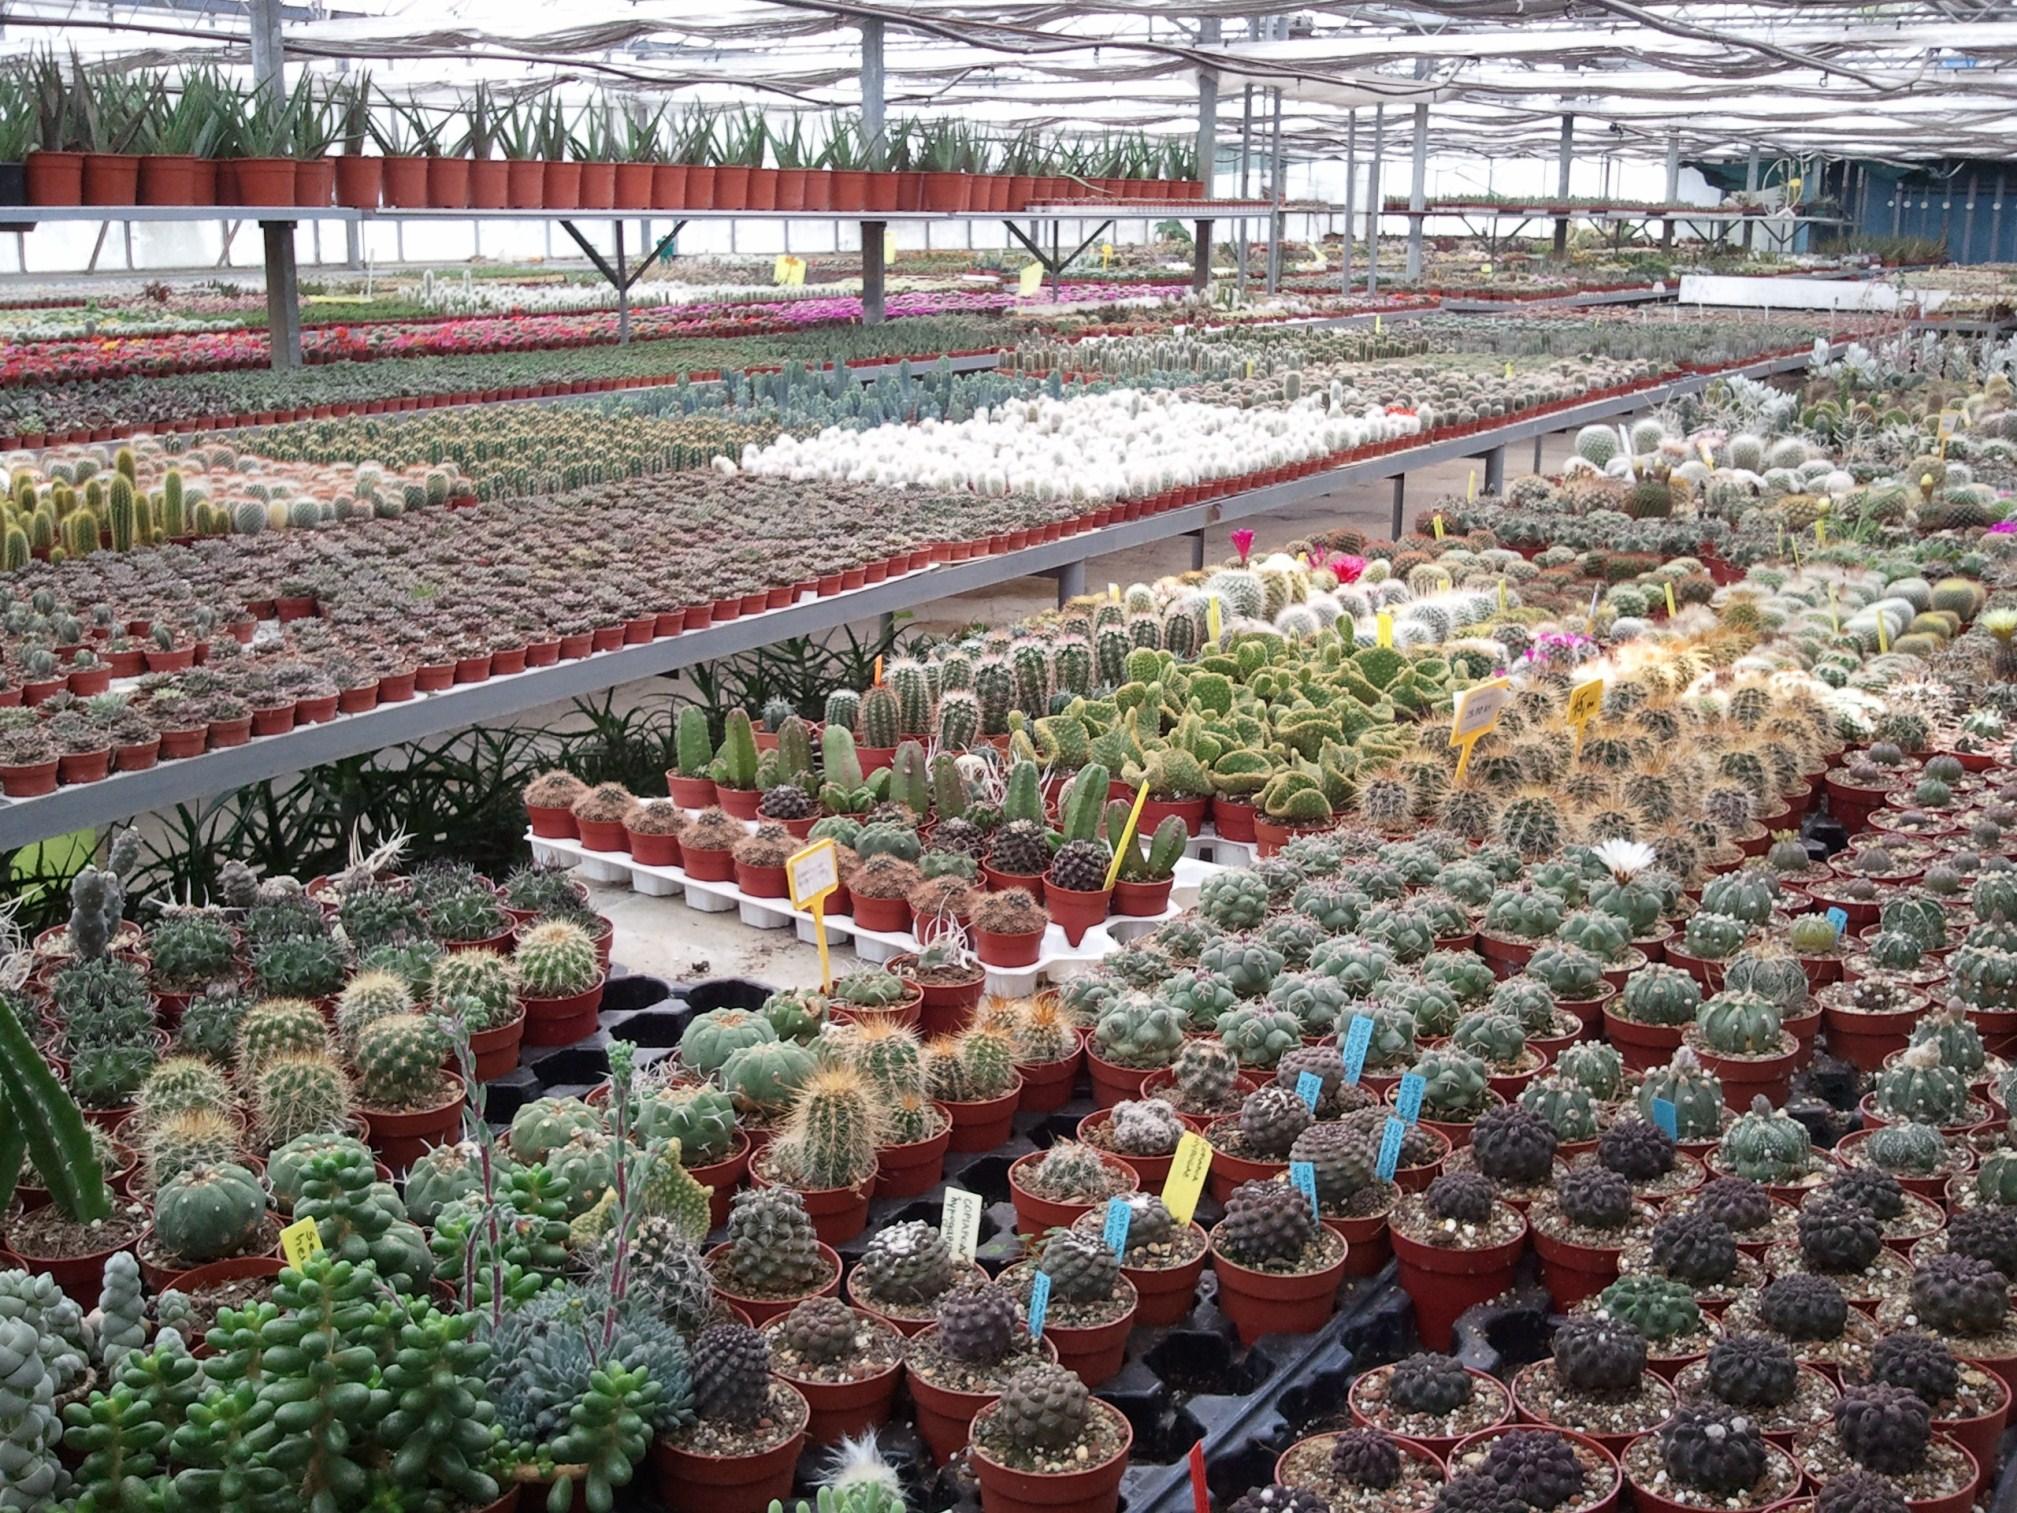 Donose li rode djecu?: Petrinja: Kaktusi Bešlić